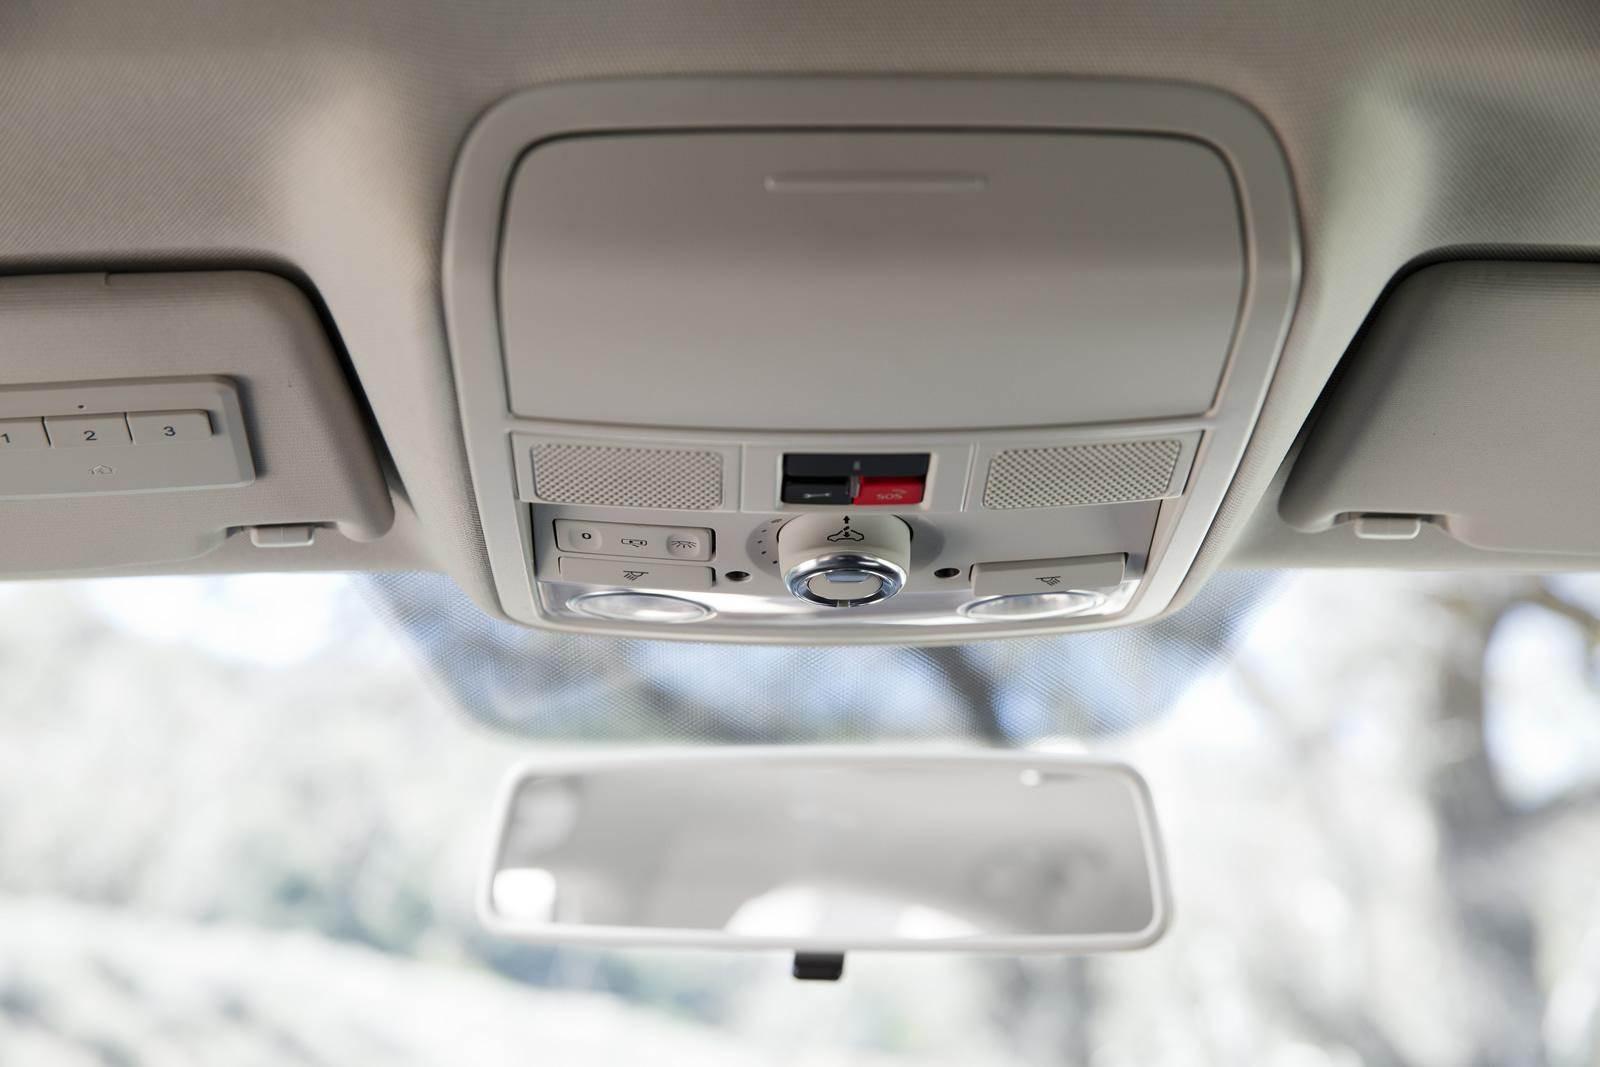 Novo Volkswagen Jetta 2015 - interior